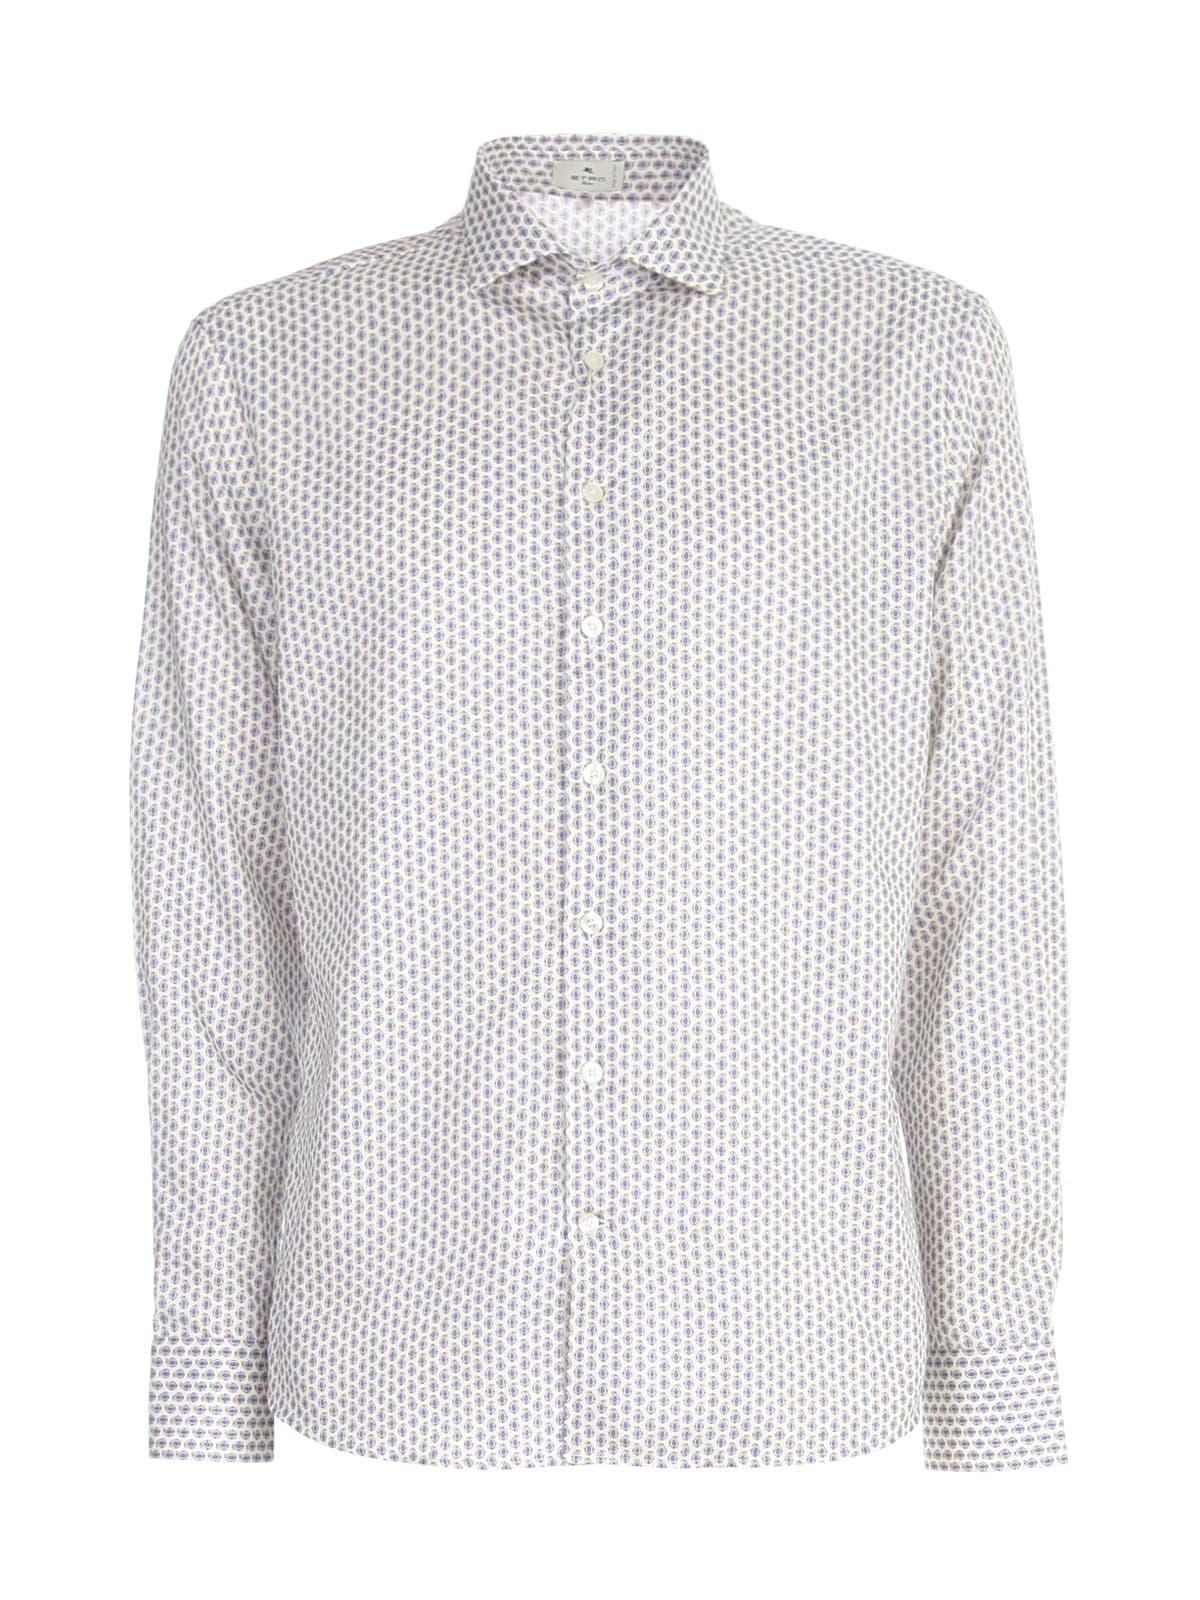 Etro Cottons MINI SPREAD SHIRT